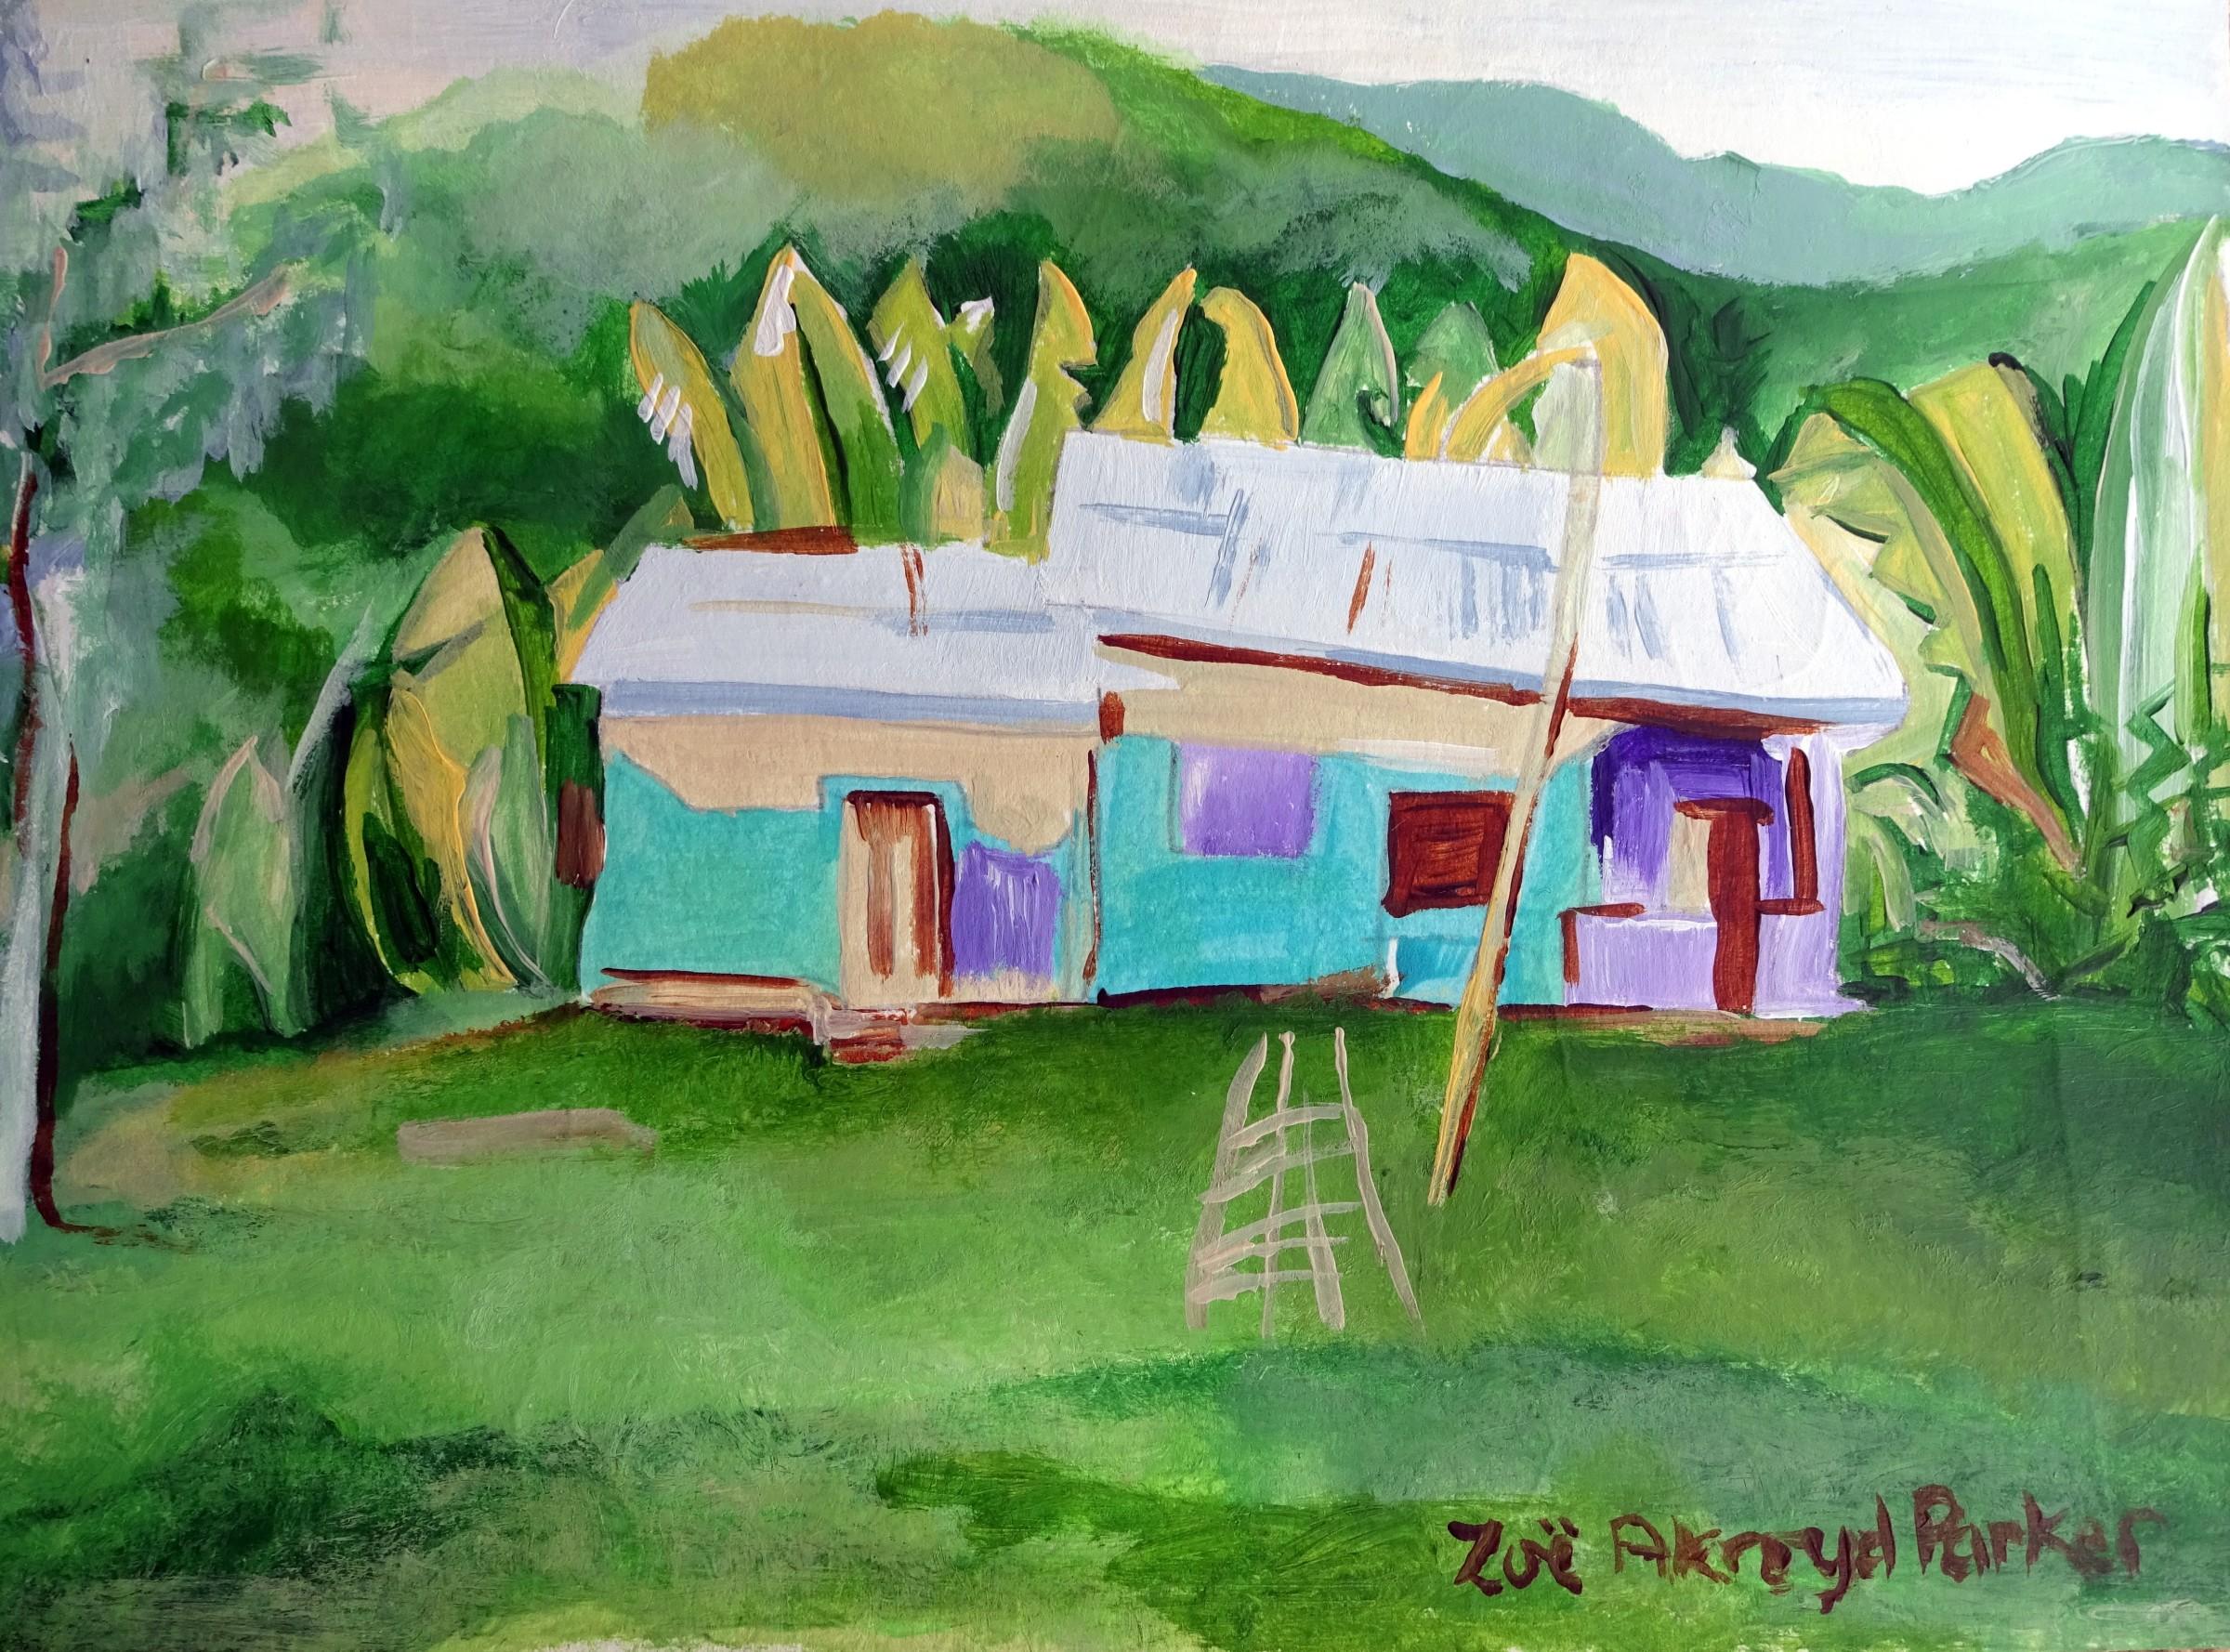 <span class=&#34;link fancybox-details-link&#34;><a href=&#34;/exhibitions/16/works/image_standalone416/&#34;>View Detail Page</a></span><p>Zoe Parker,&#160;<em>Little House, Big Banana Leaves,</em>&#160;&#163;250</p>